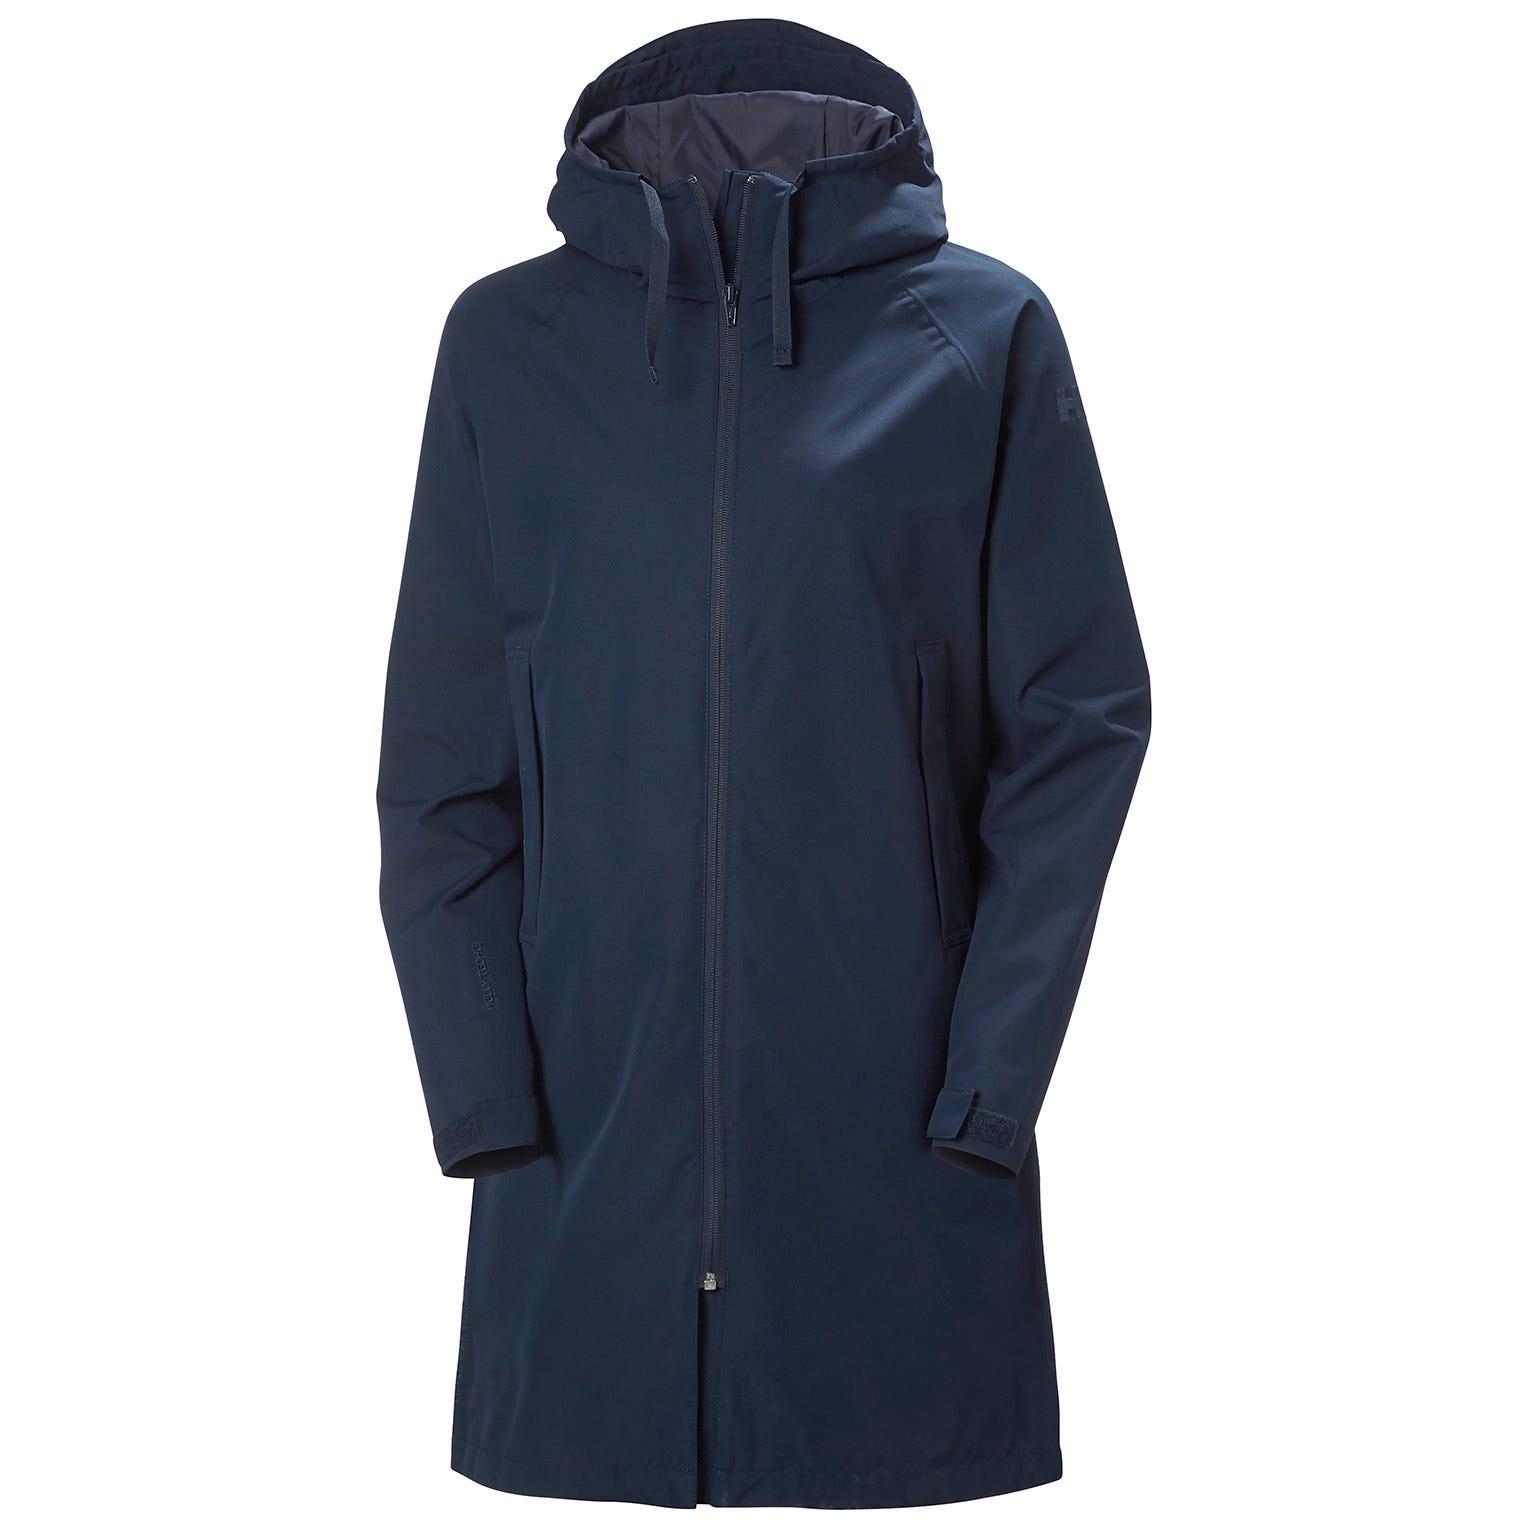 Helly Hansen Womens Mono Material Waterproof Raincoat Navy L